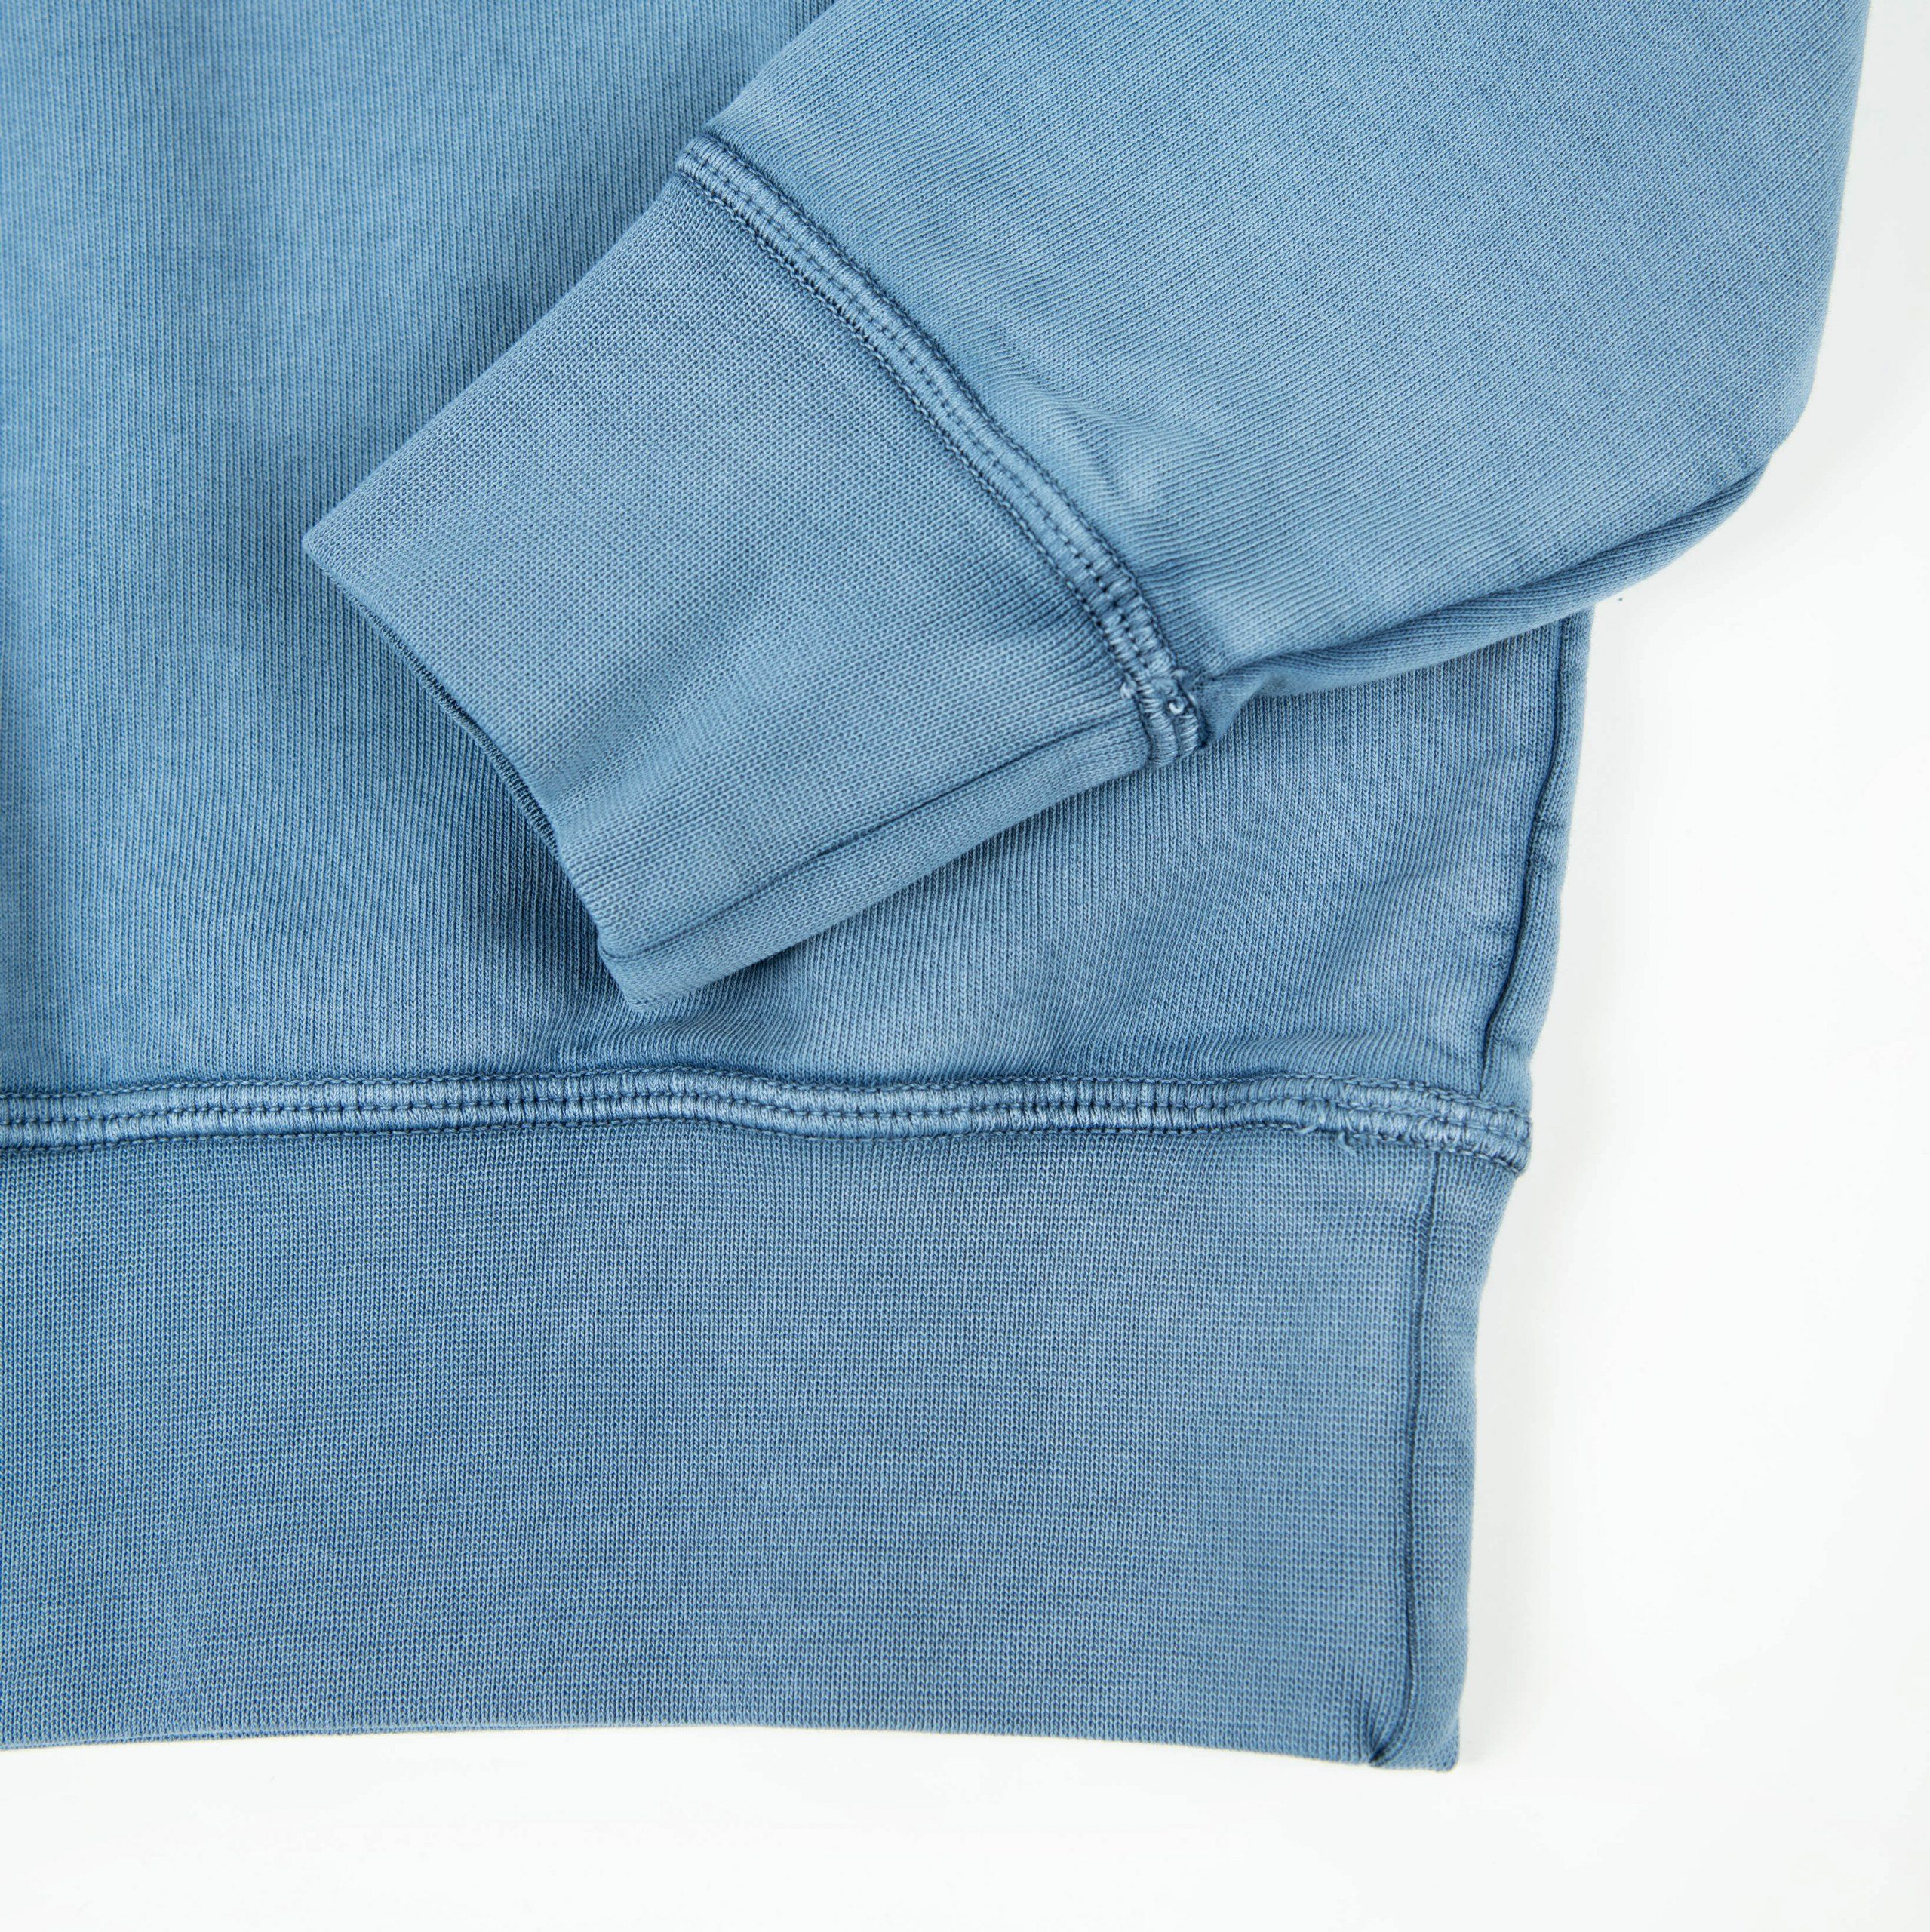 Poloshow North Sails Sweatshirt Jeans 691547 000 0790 500 4